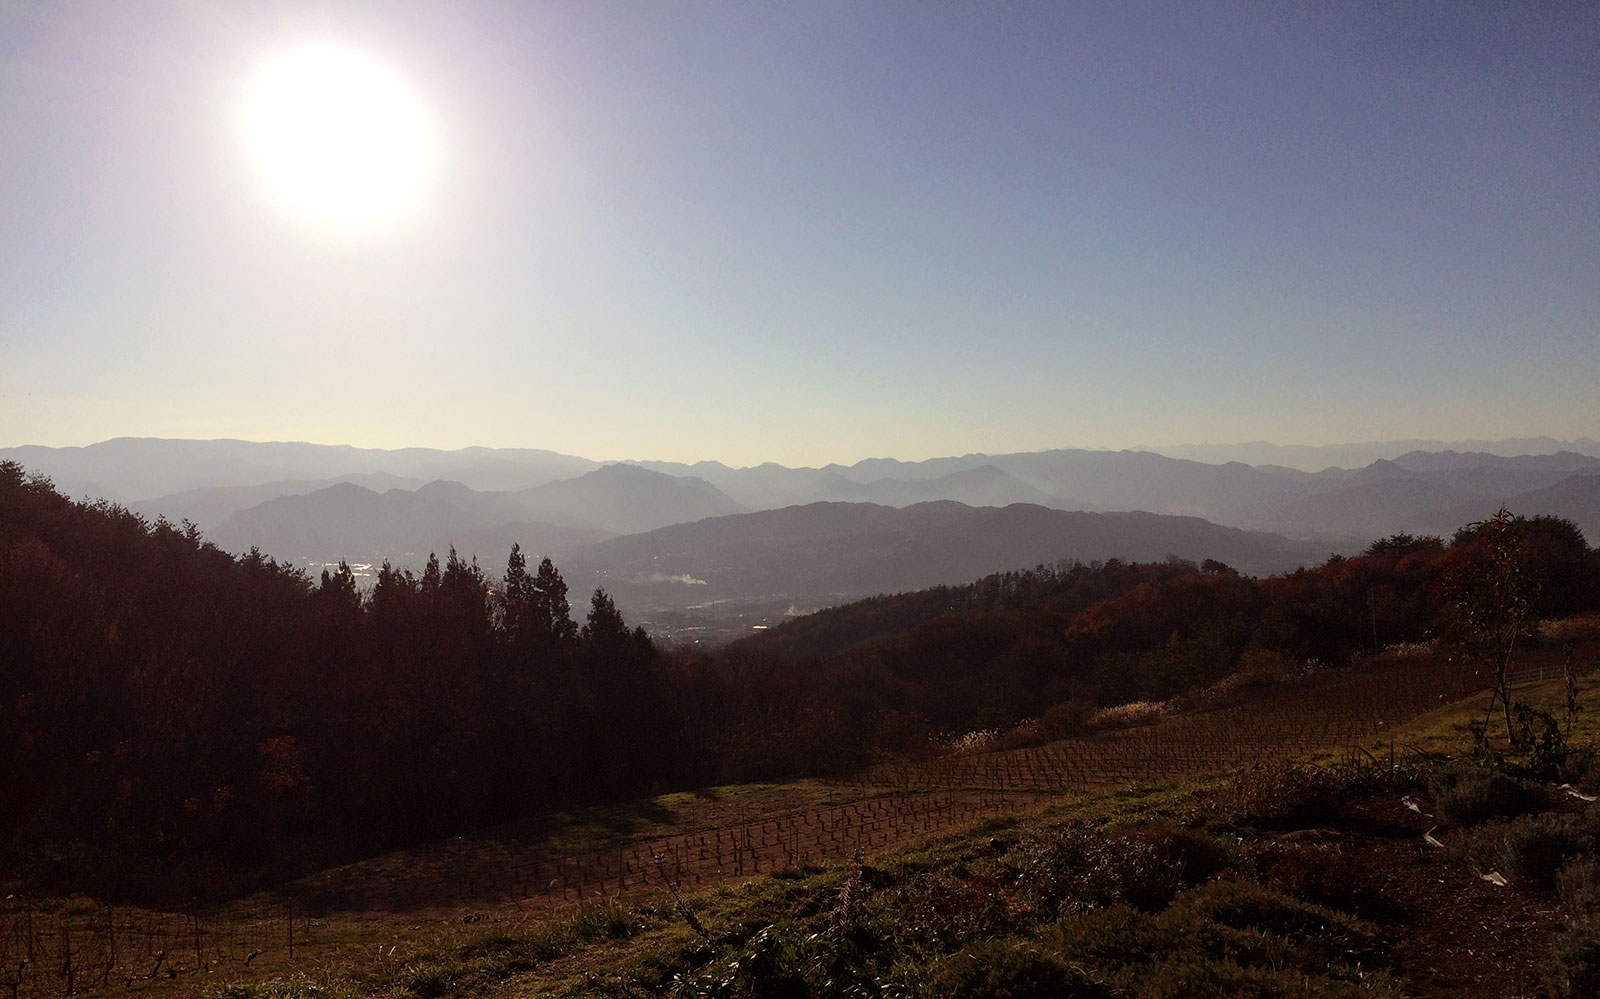 nagano-winery-1